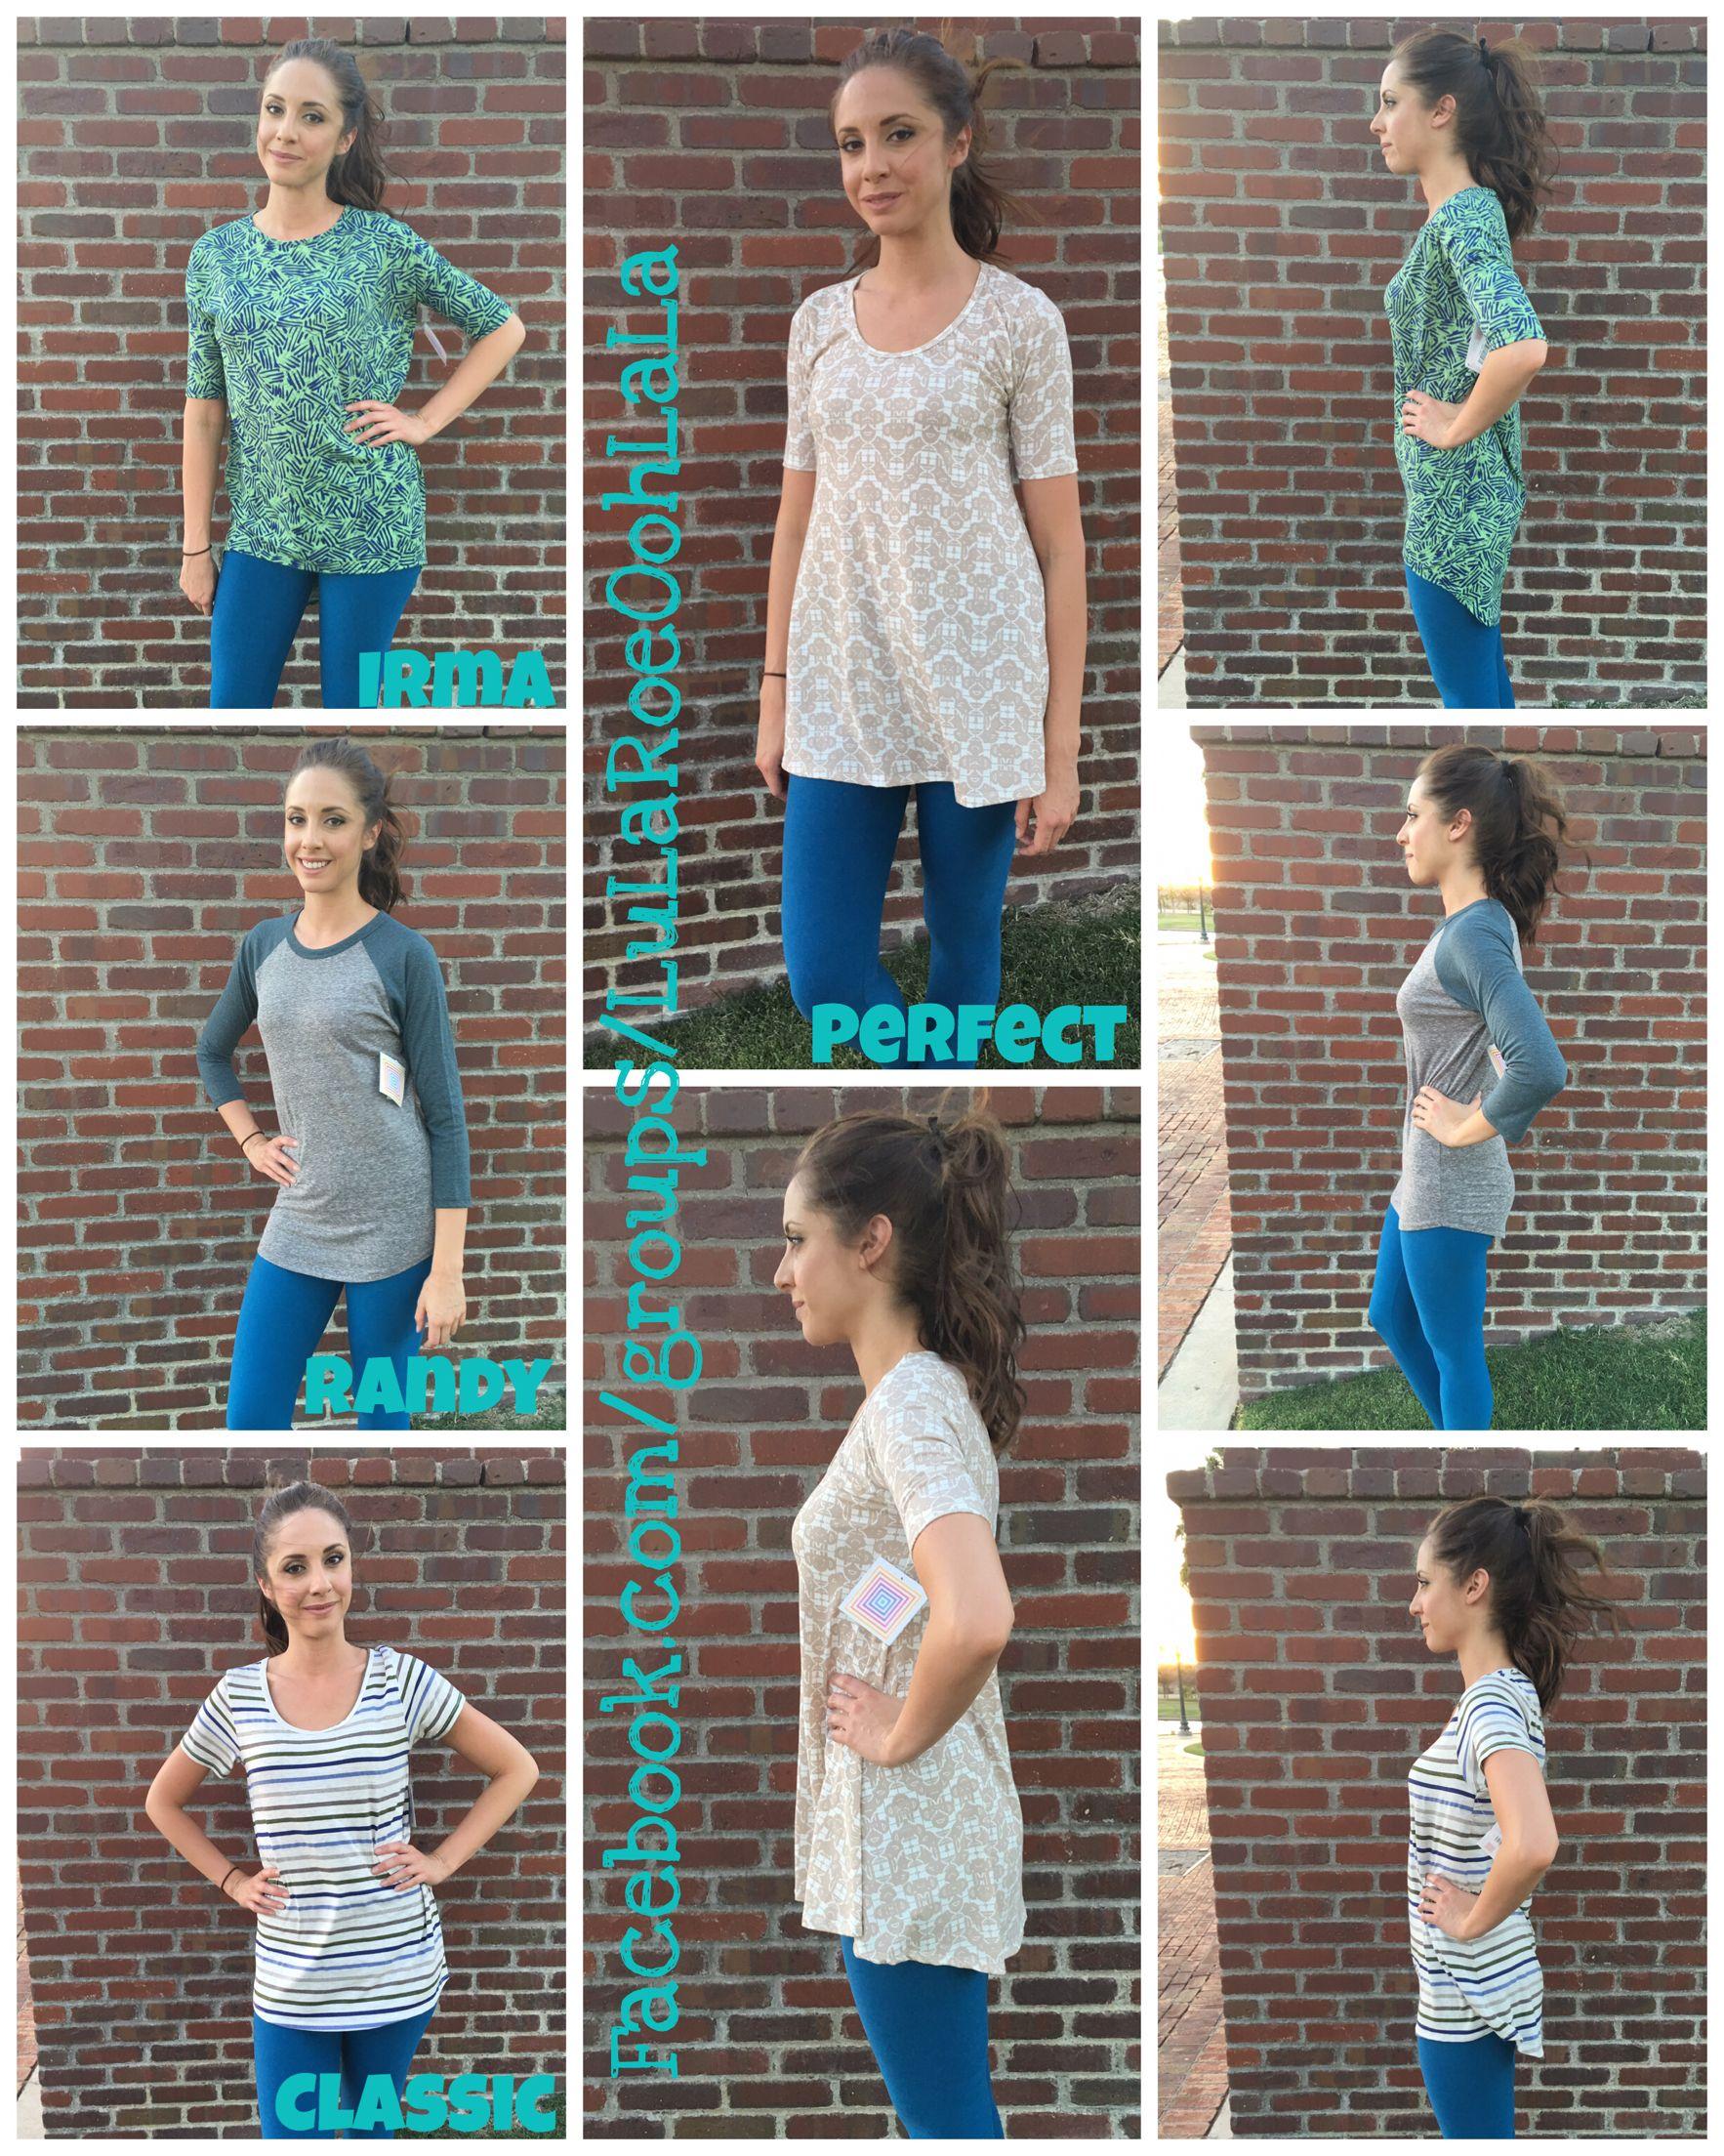 Leggings New Lularoe Irma Shirt S Modern Design Clothing, Shoes & Accessories